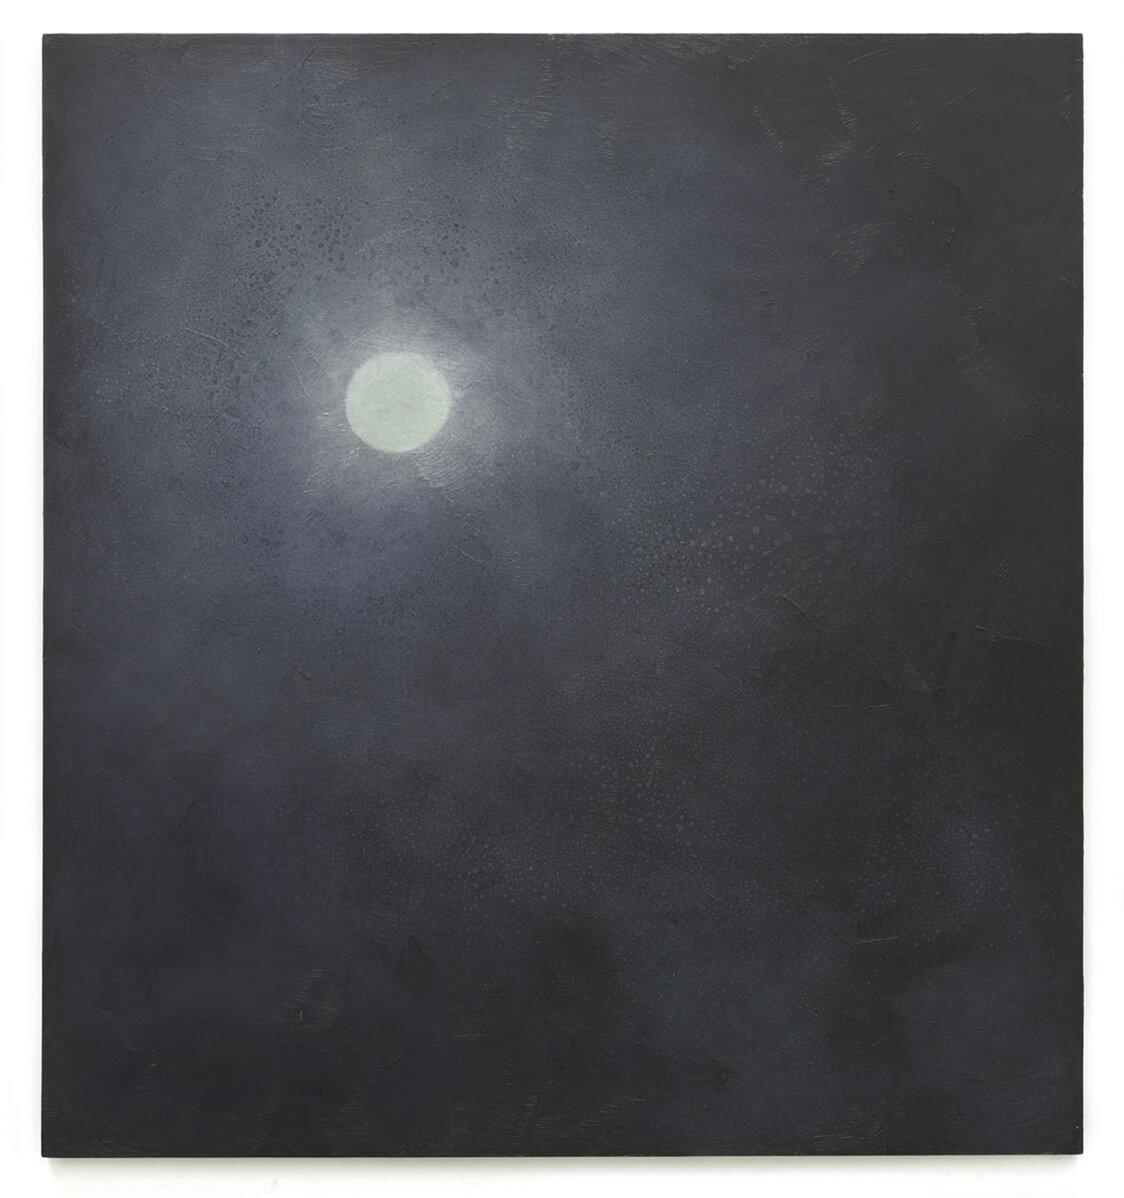 "Day 4, 2002, Oil on canvas, 78"" x 72""  Made in California: Art + Photographic Portraits of Artists by Shimabukuro Robert and Frances Fullerton Museum of Art  California State University San Bernardino  Through December 7, 2019"